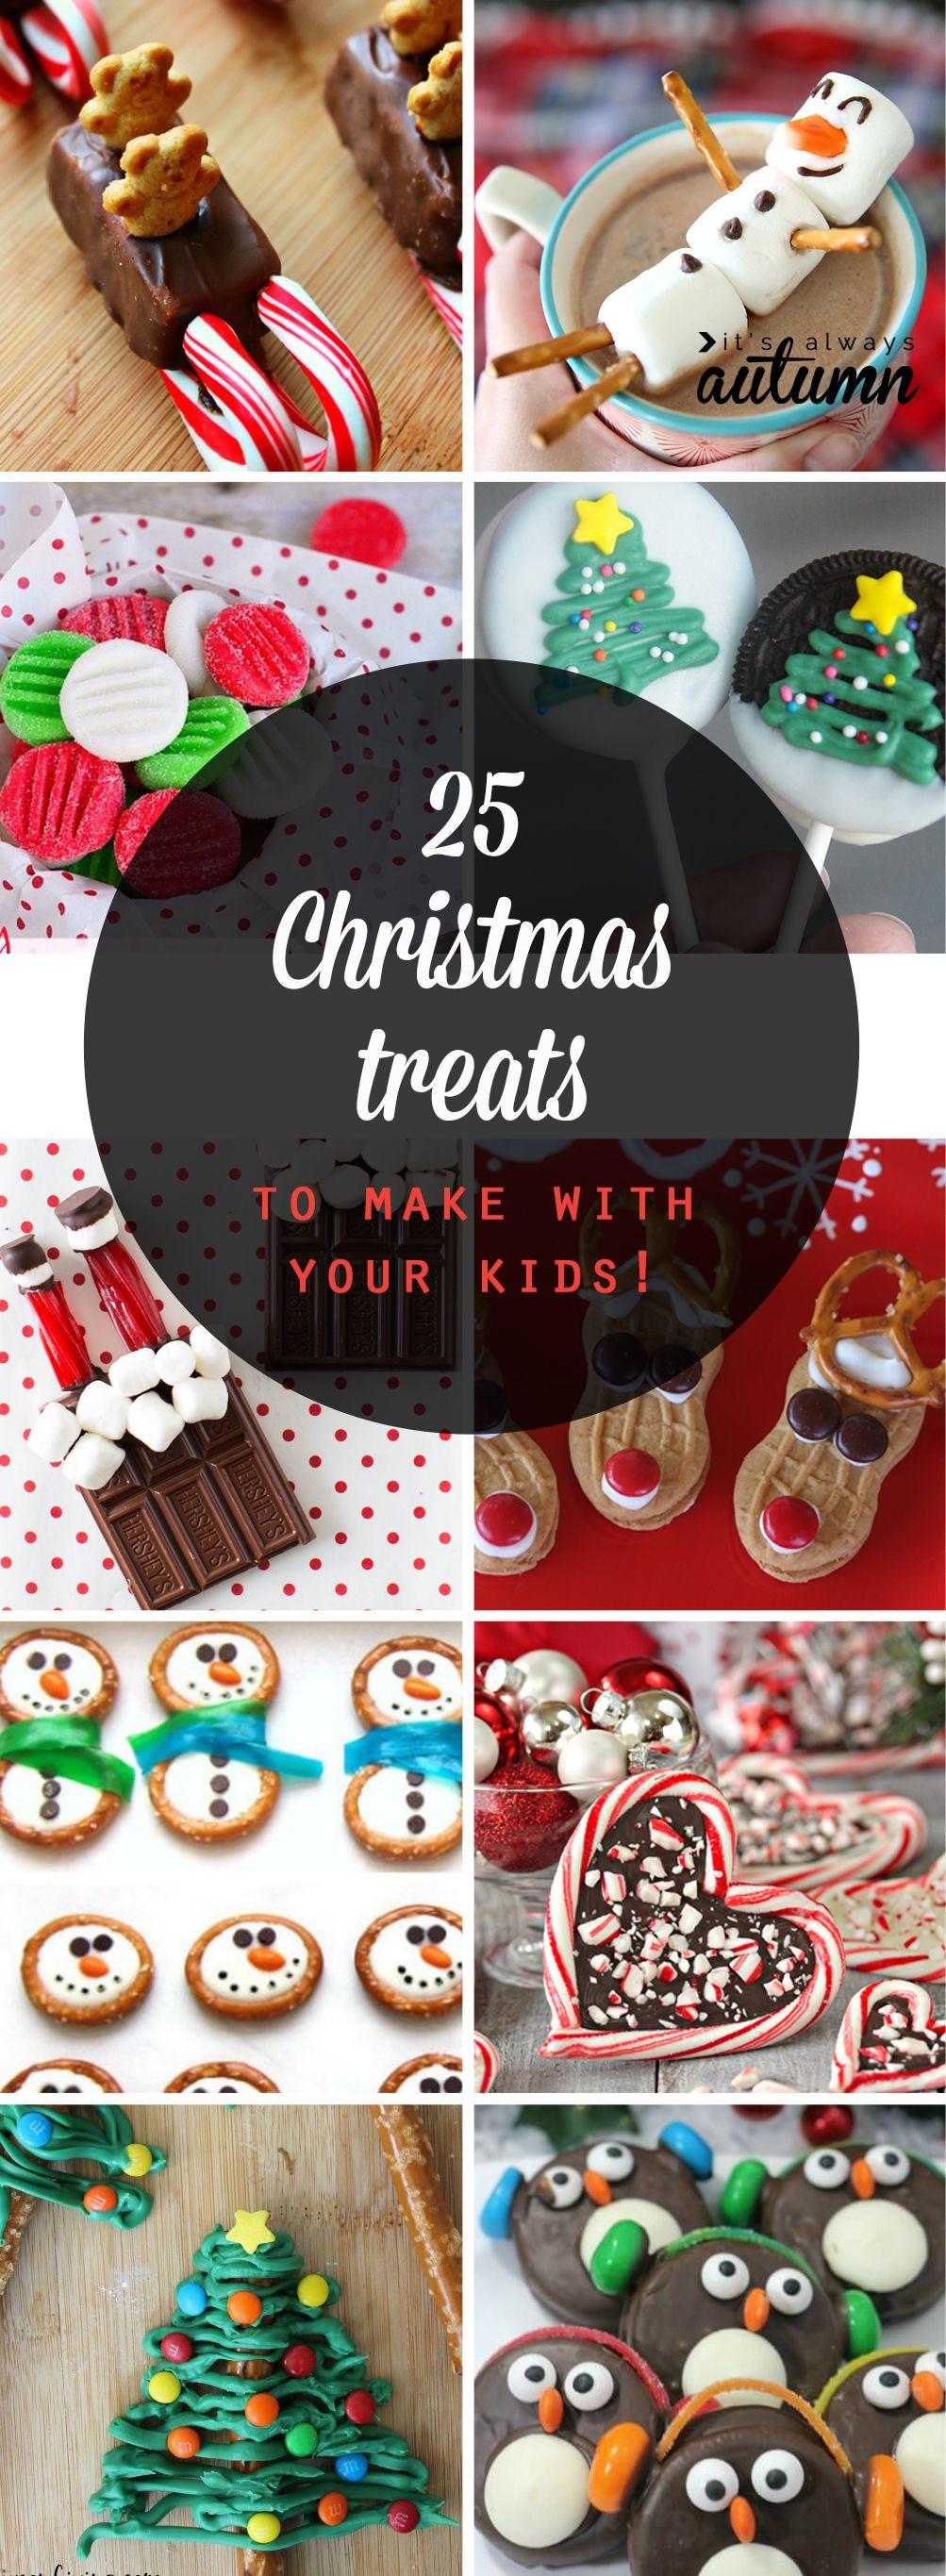 Easy Christmas Cookies To Make With Kids  25 adorable Christmas treats to make with your kids